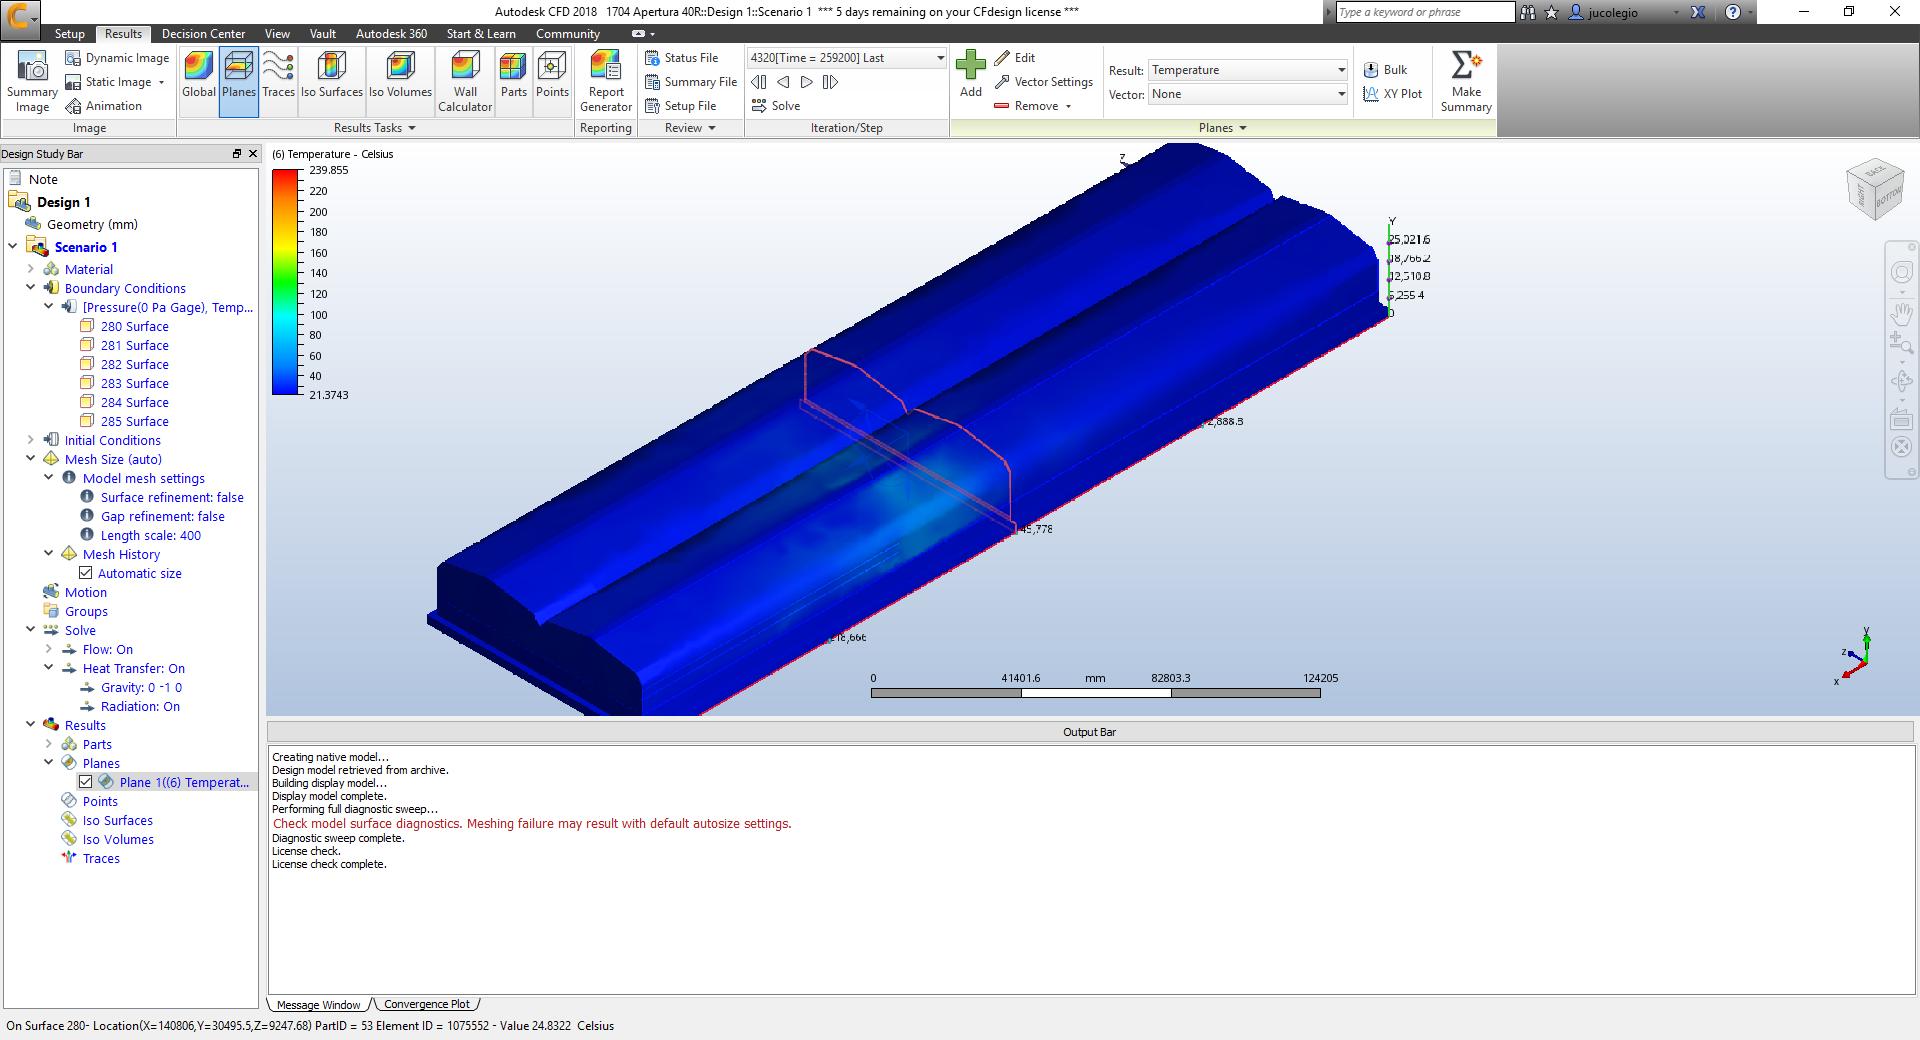 autodesk simulation community rh simhub autodesk com